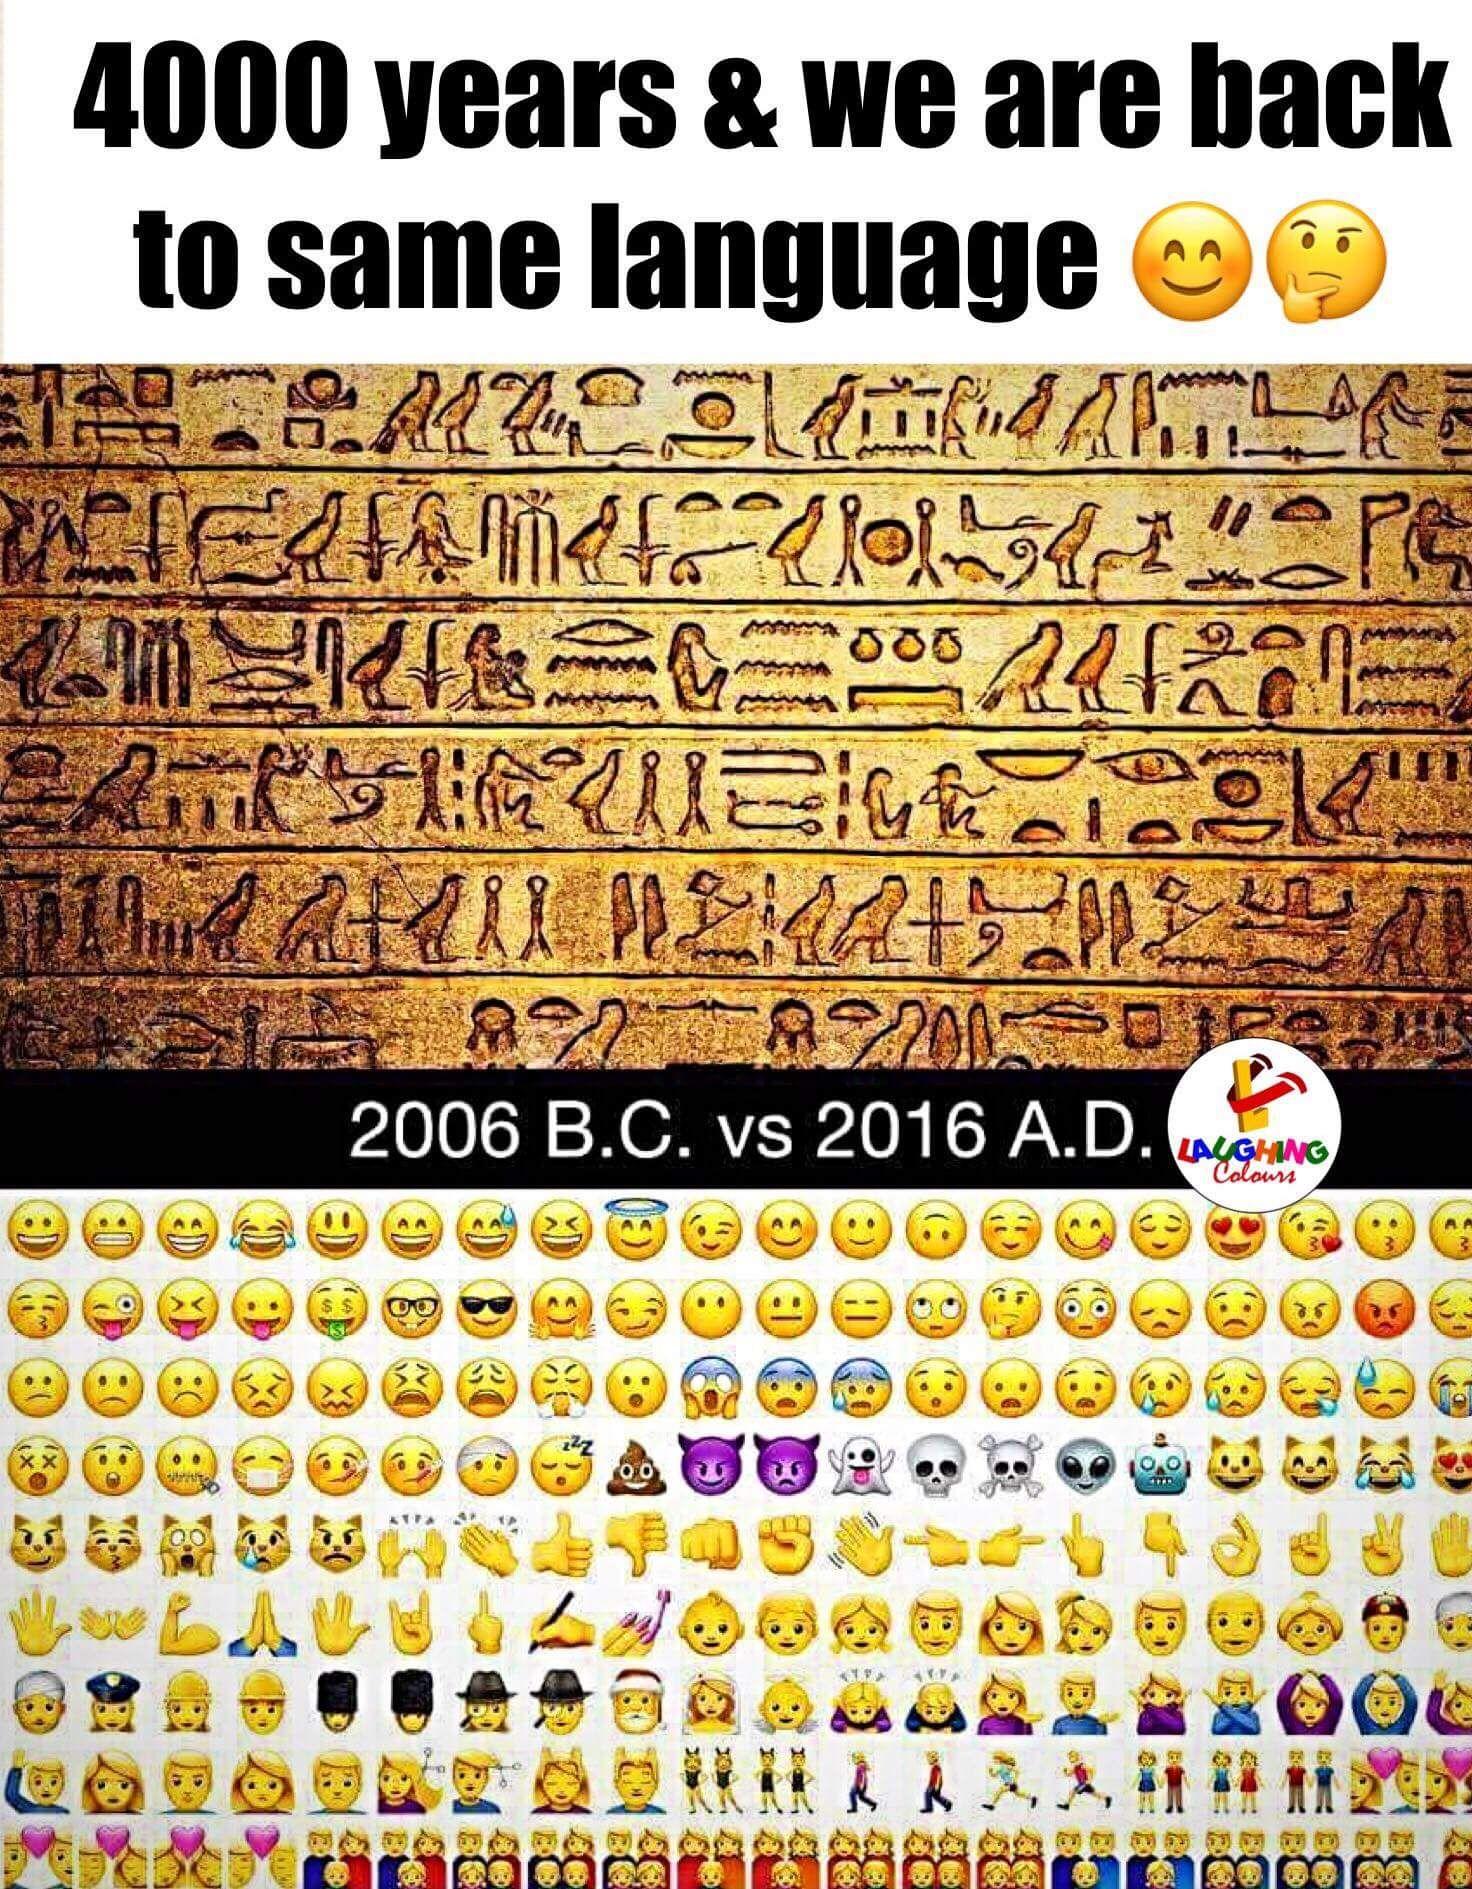 4000 years...